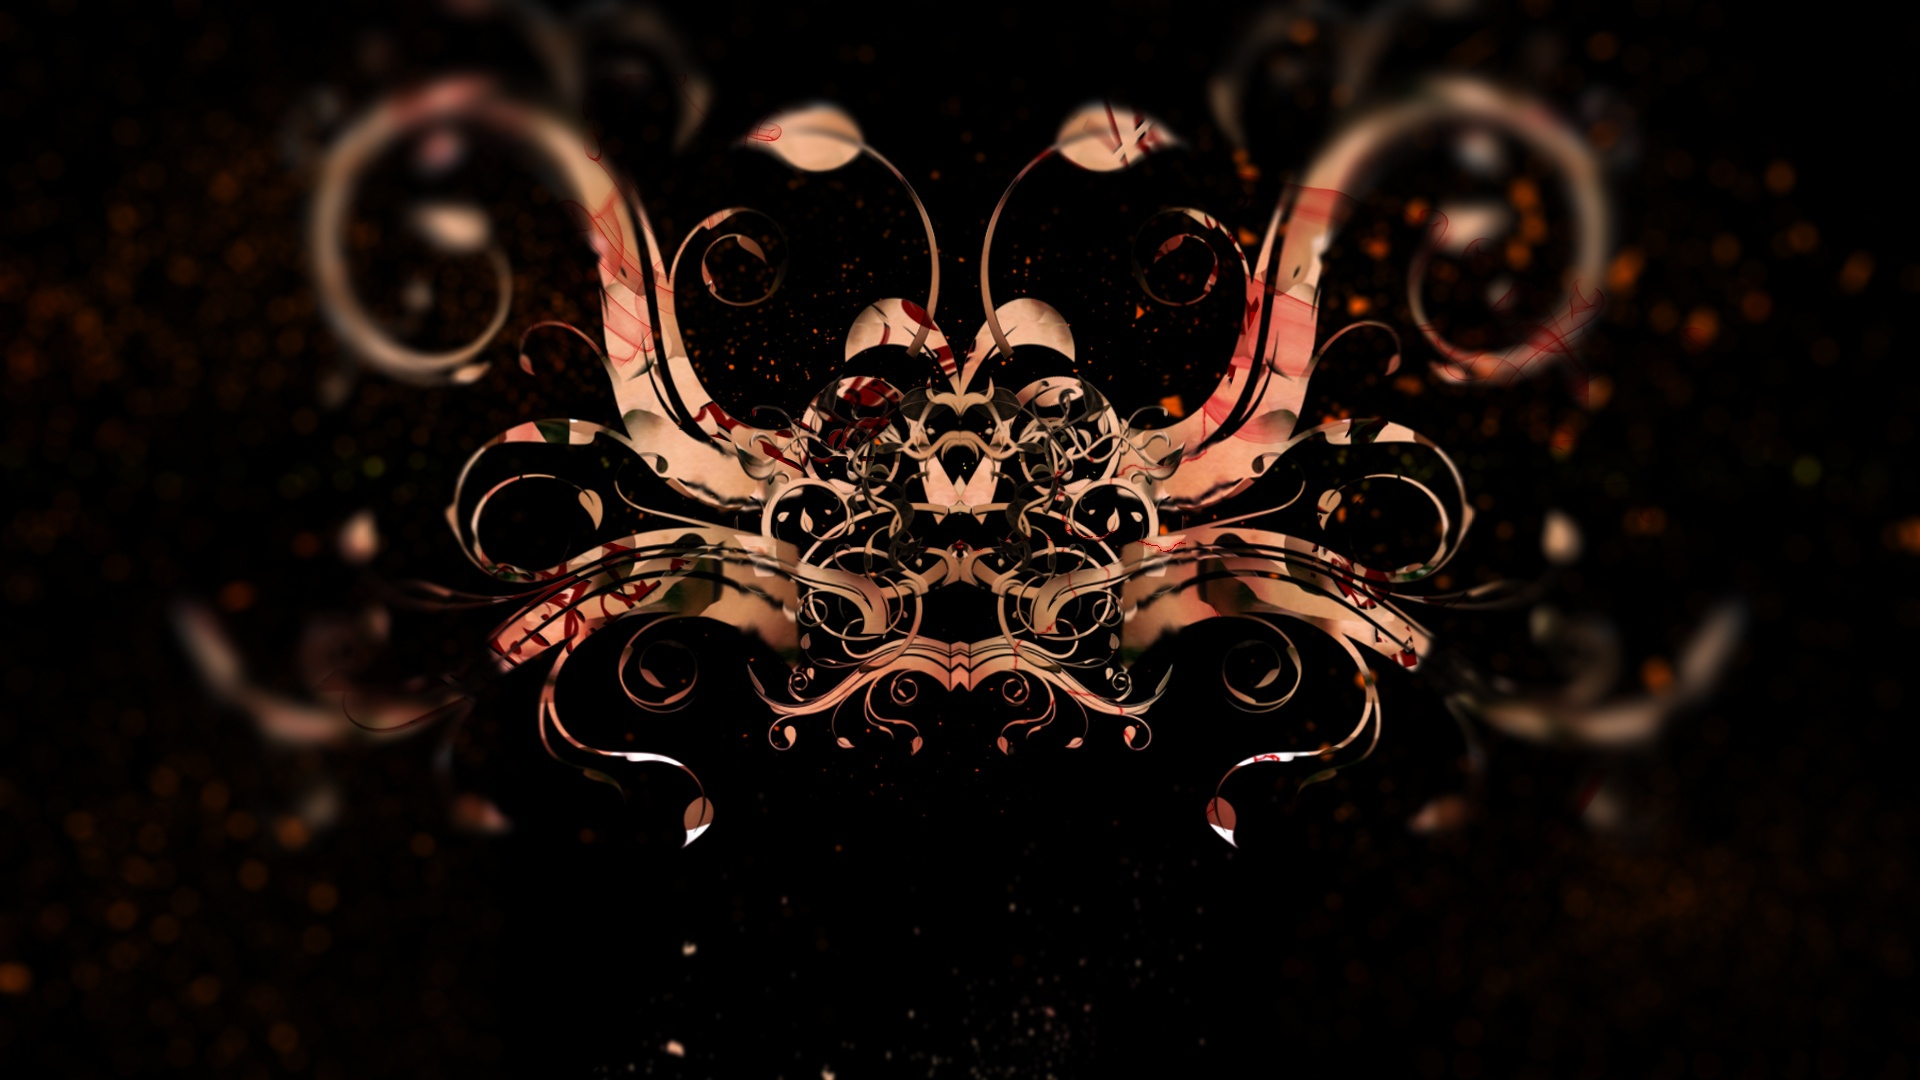 Crown Wallpapers HD 1920x1080